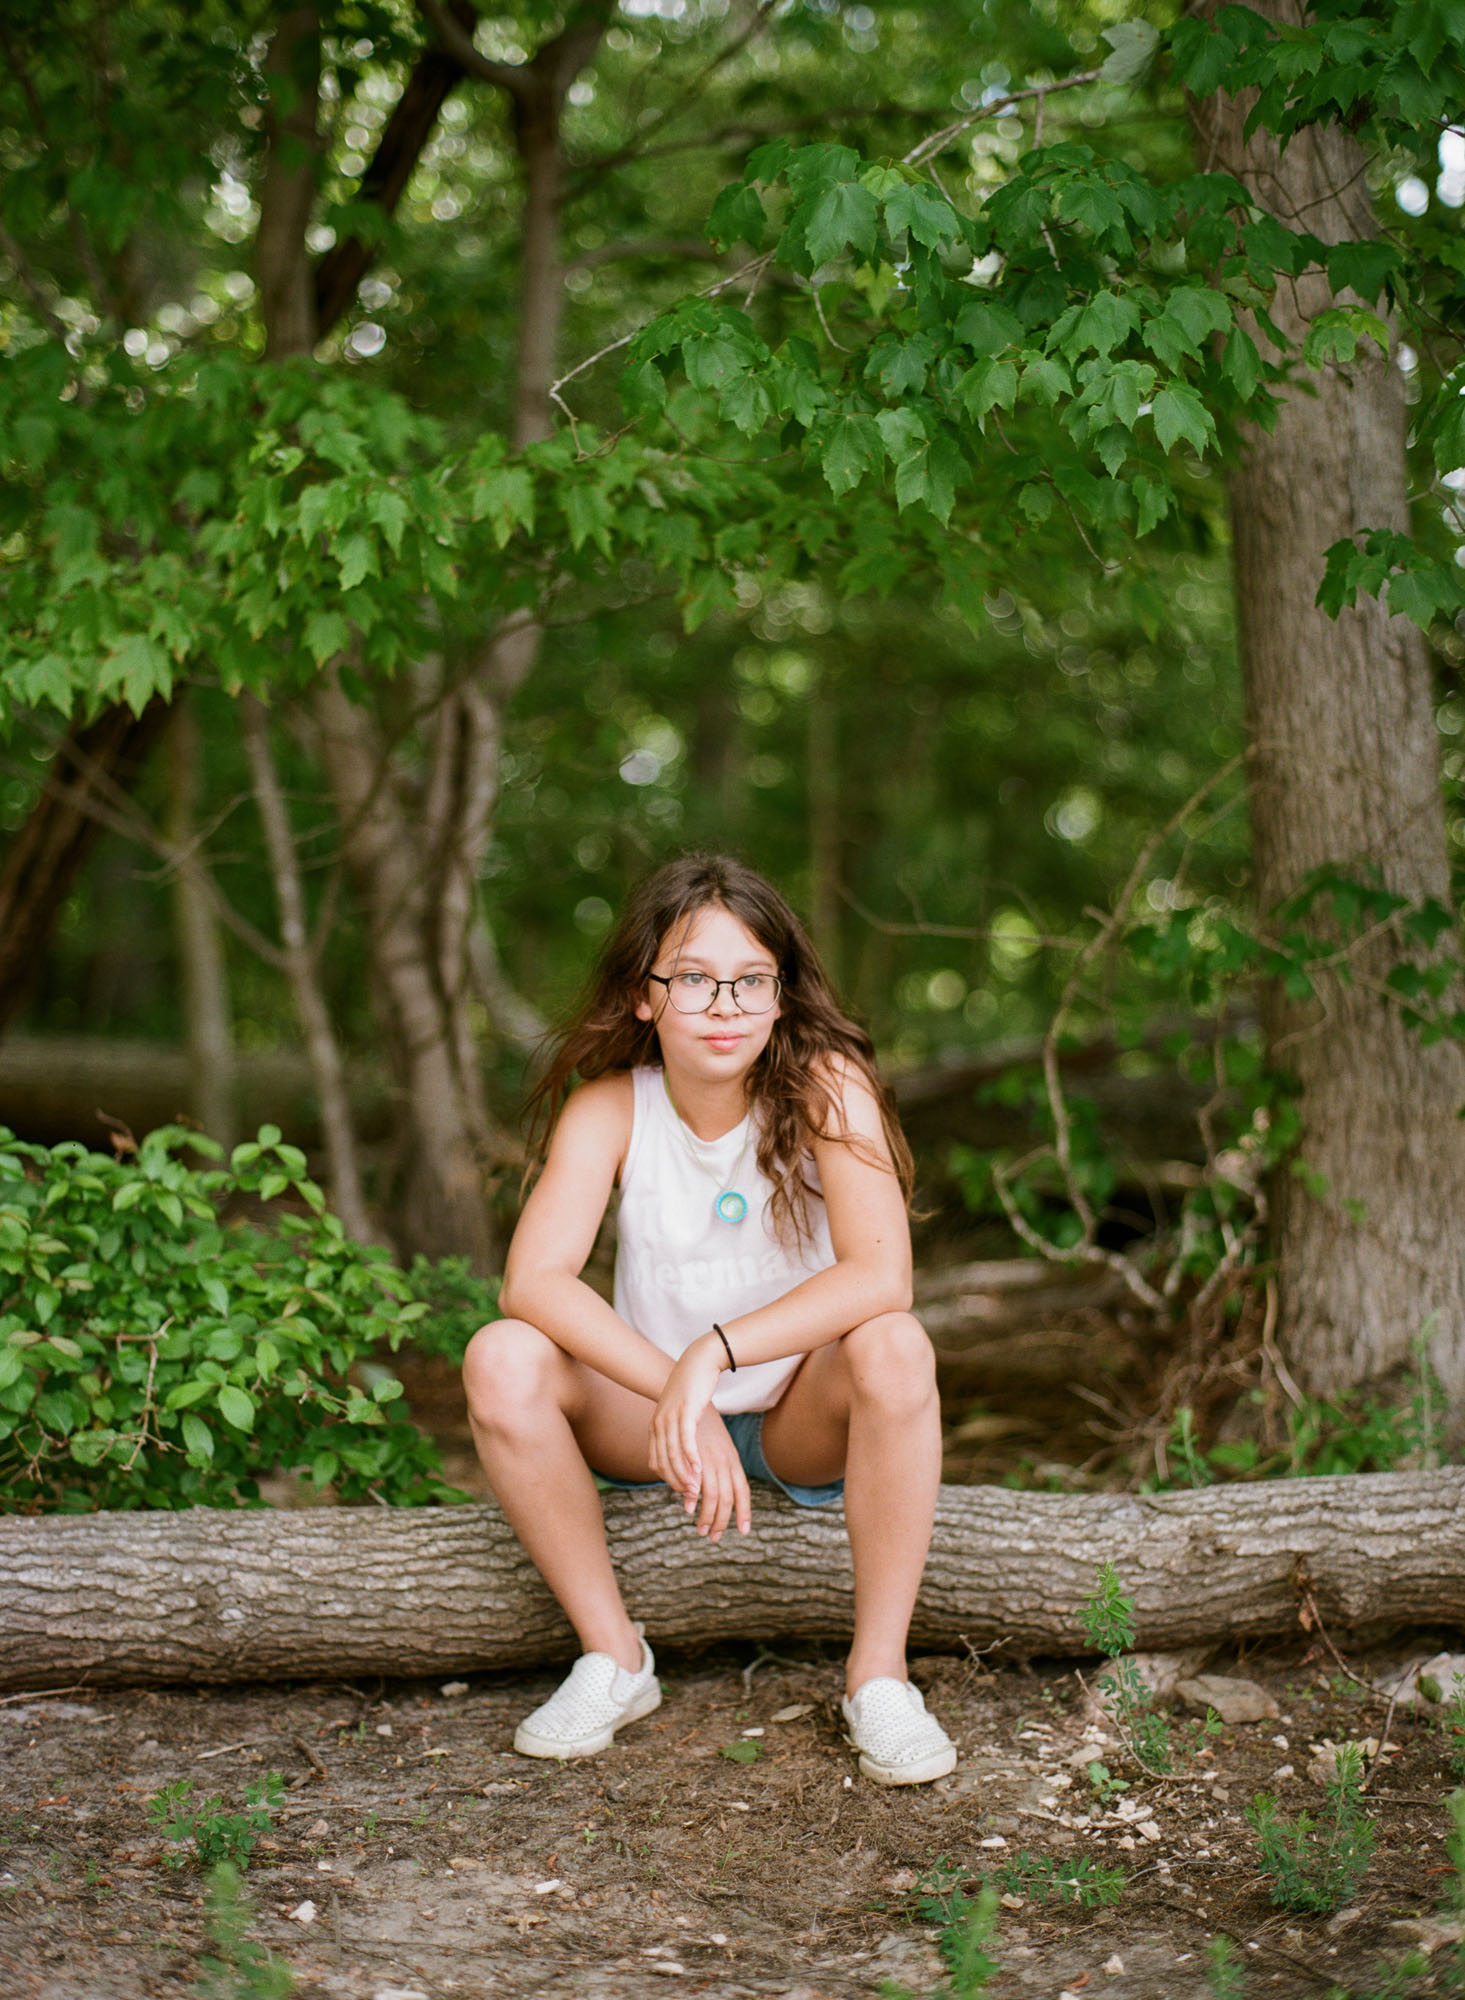 raleigh-family-photographer-studio-milestone-baby-photography-006